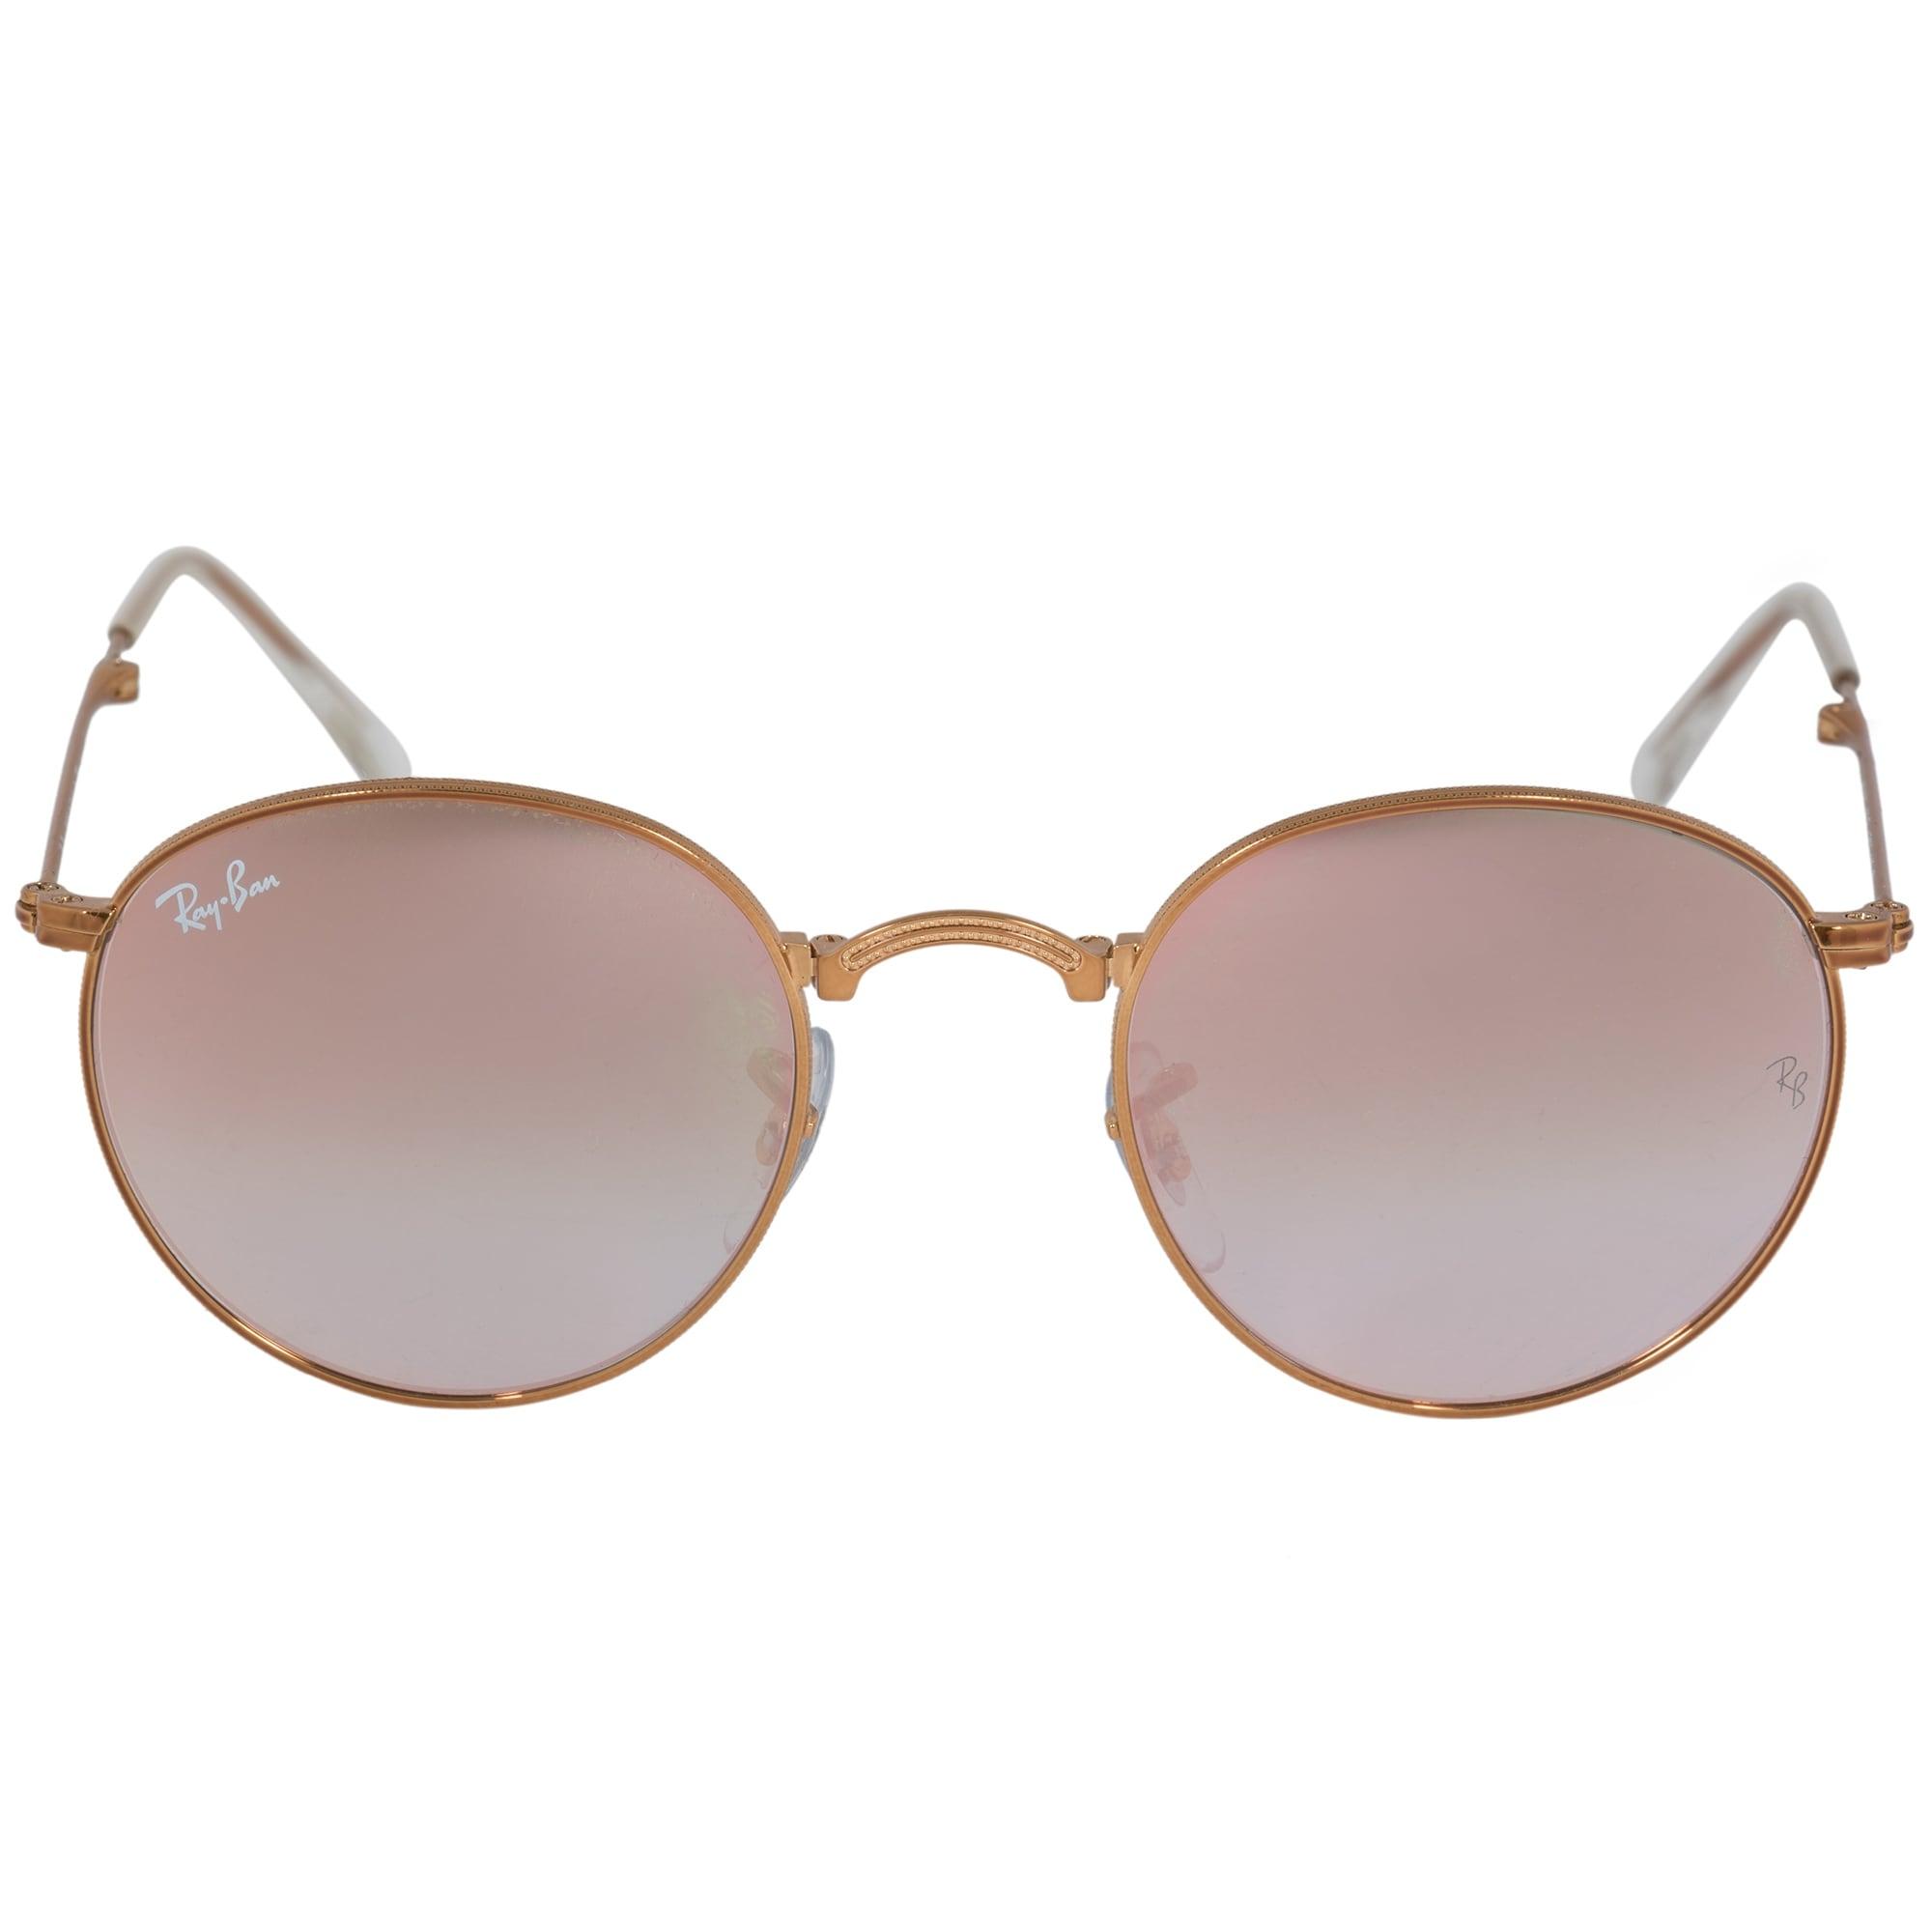 31638e56ef Shop Ray-Ban Round Folding Sunglasses RB3532 1987Y 47